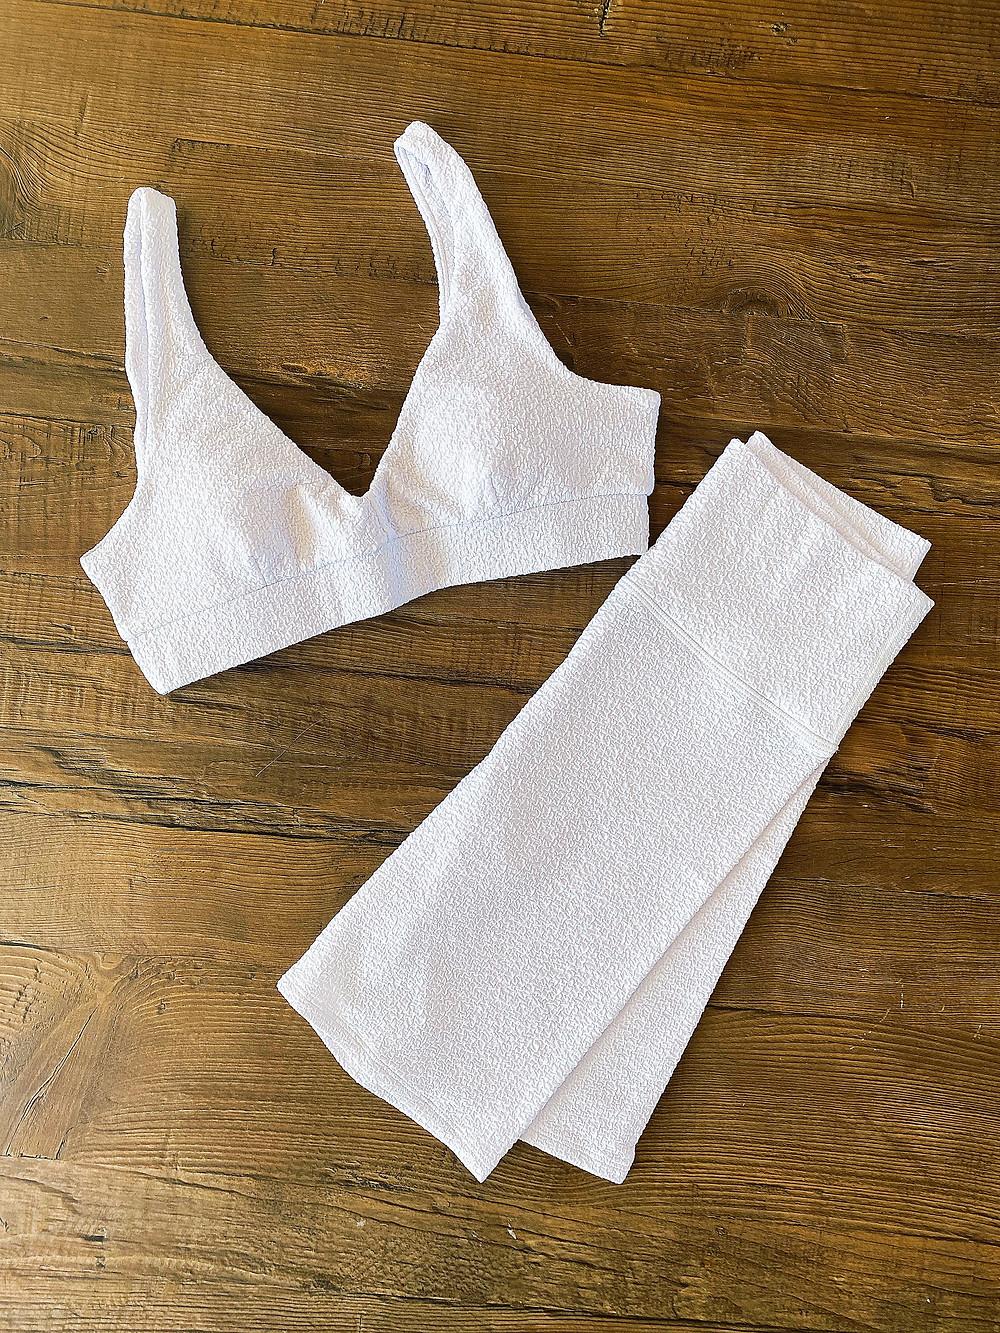 Yoga Fashion - Best Biker Shorts - Malibu Crinkle Biker Shorts & Malibu Crinkle V Neck Bra